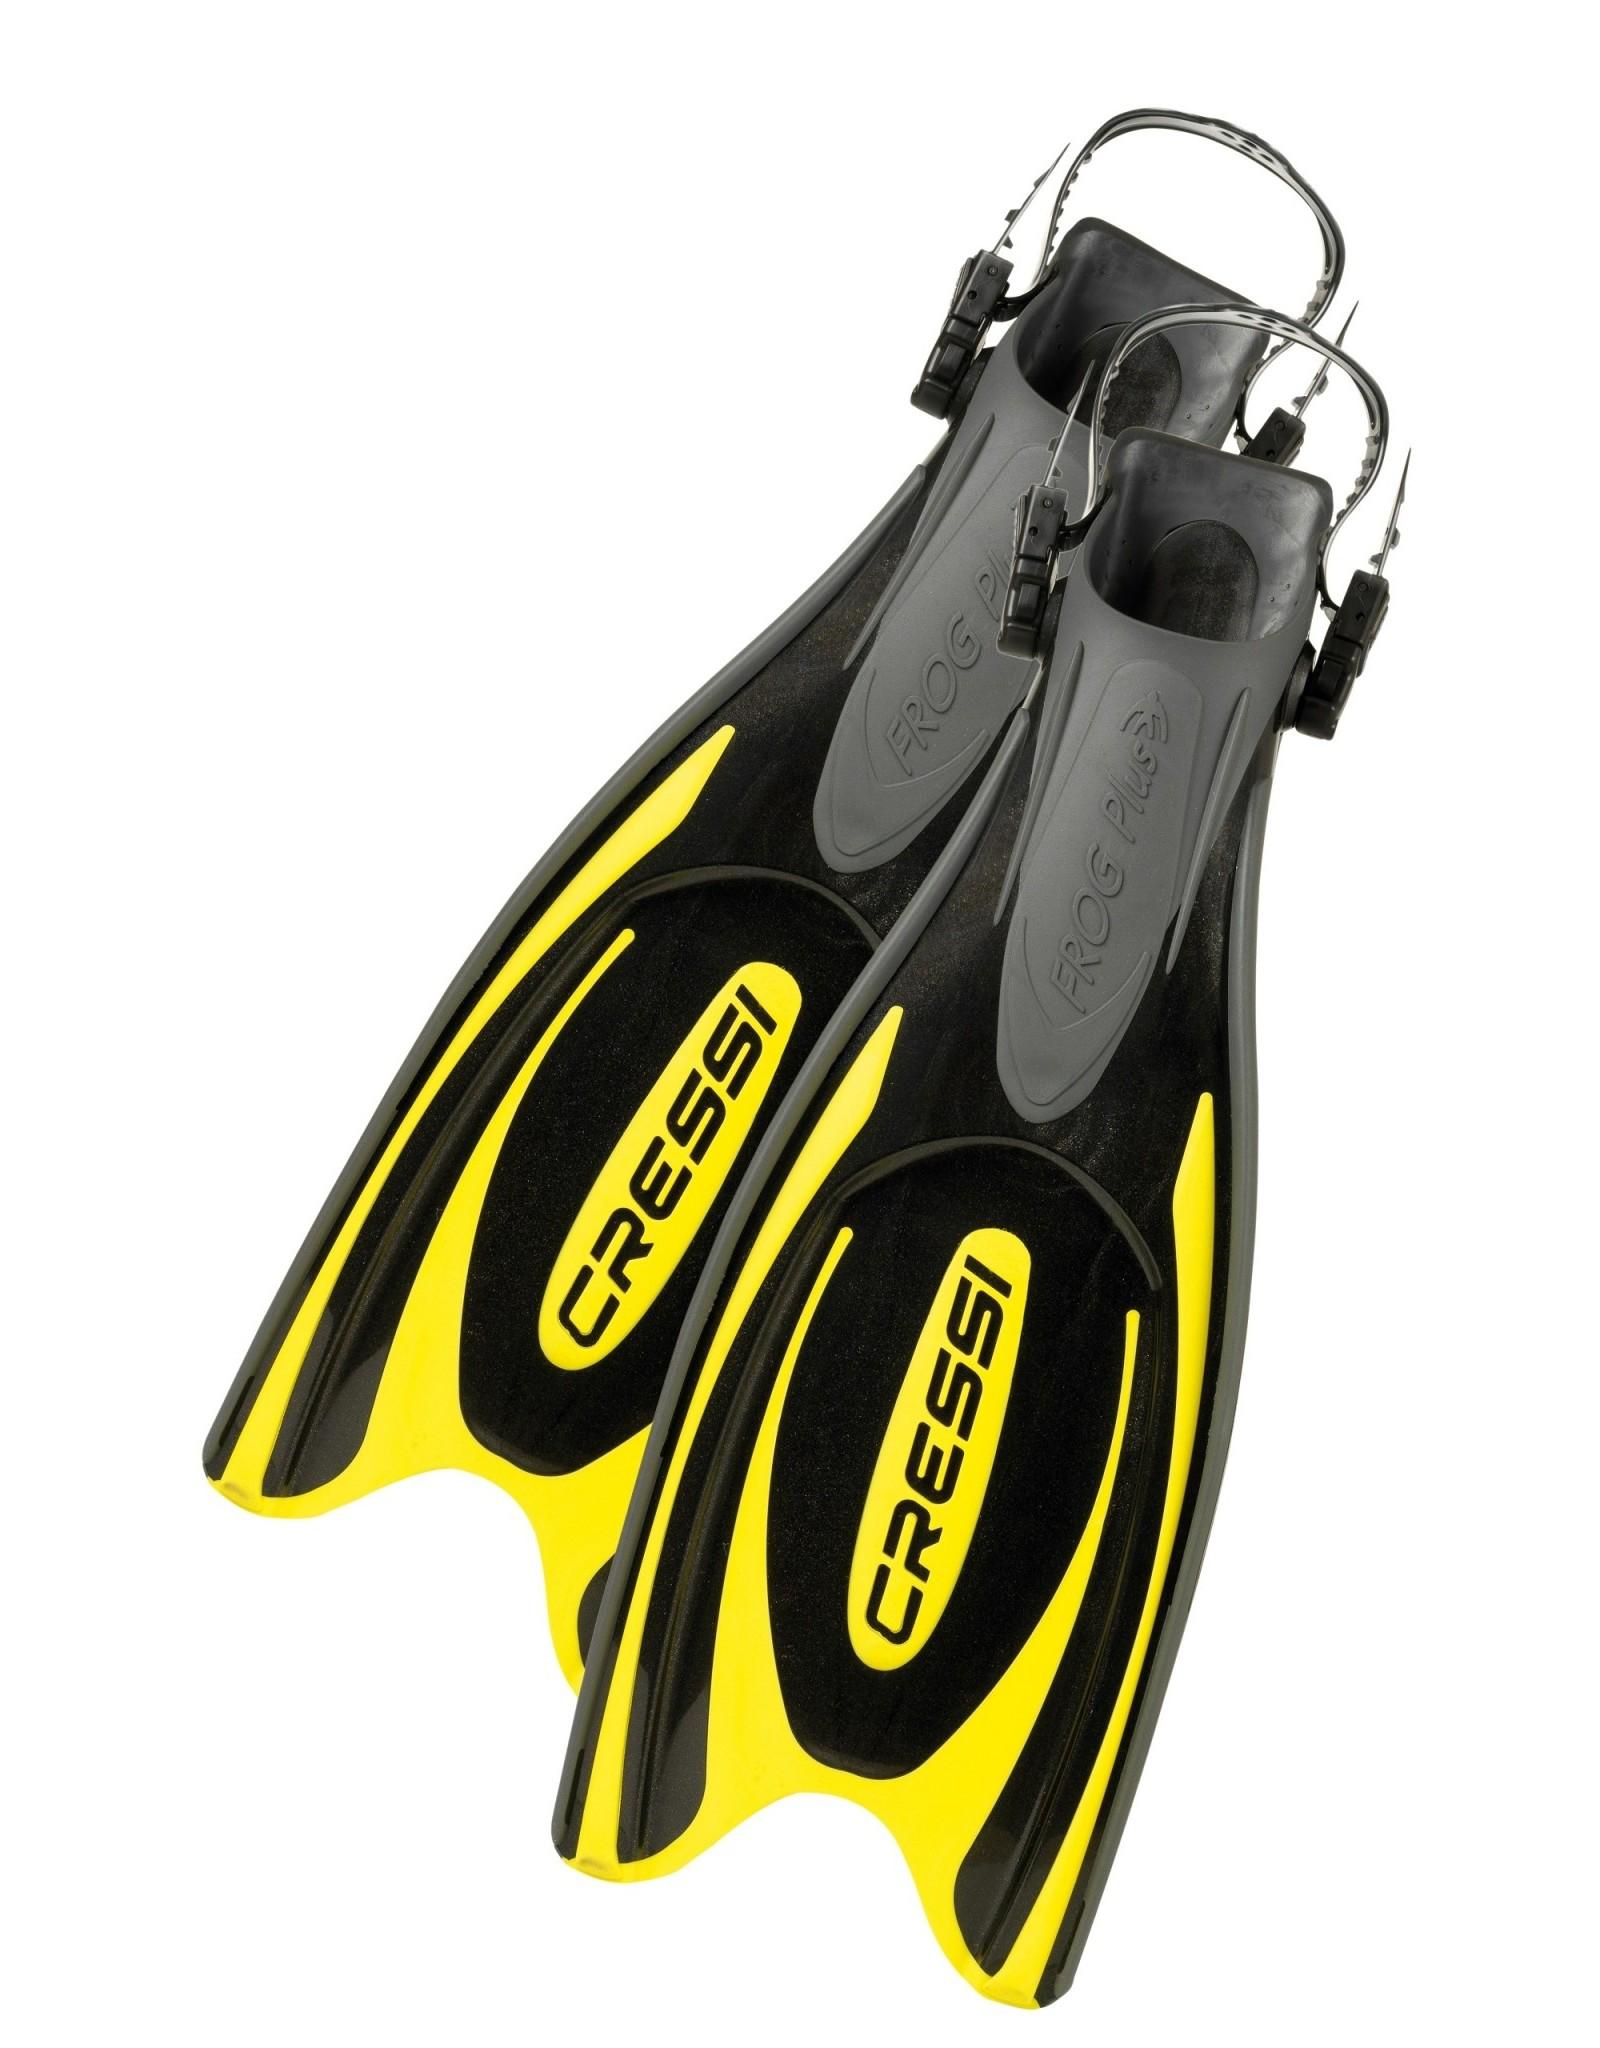 Cressi Cressi FROG PLUS - Black/Yellow